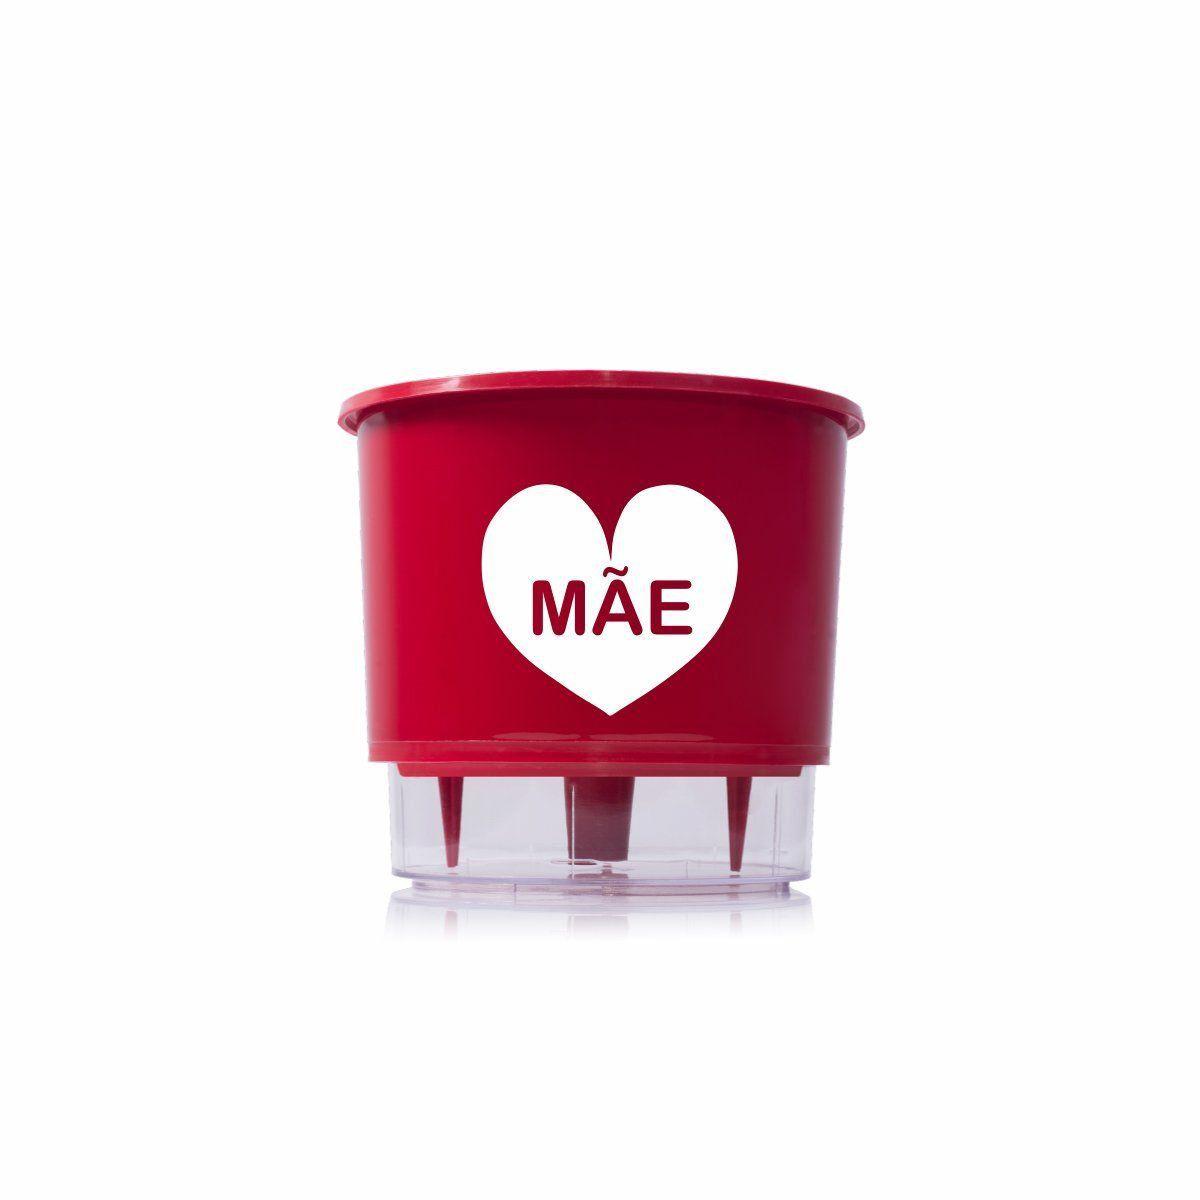 Vaso Autoirrigável Médio N03 Vermelho Mãe 16cm x 14cm